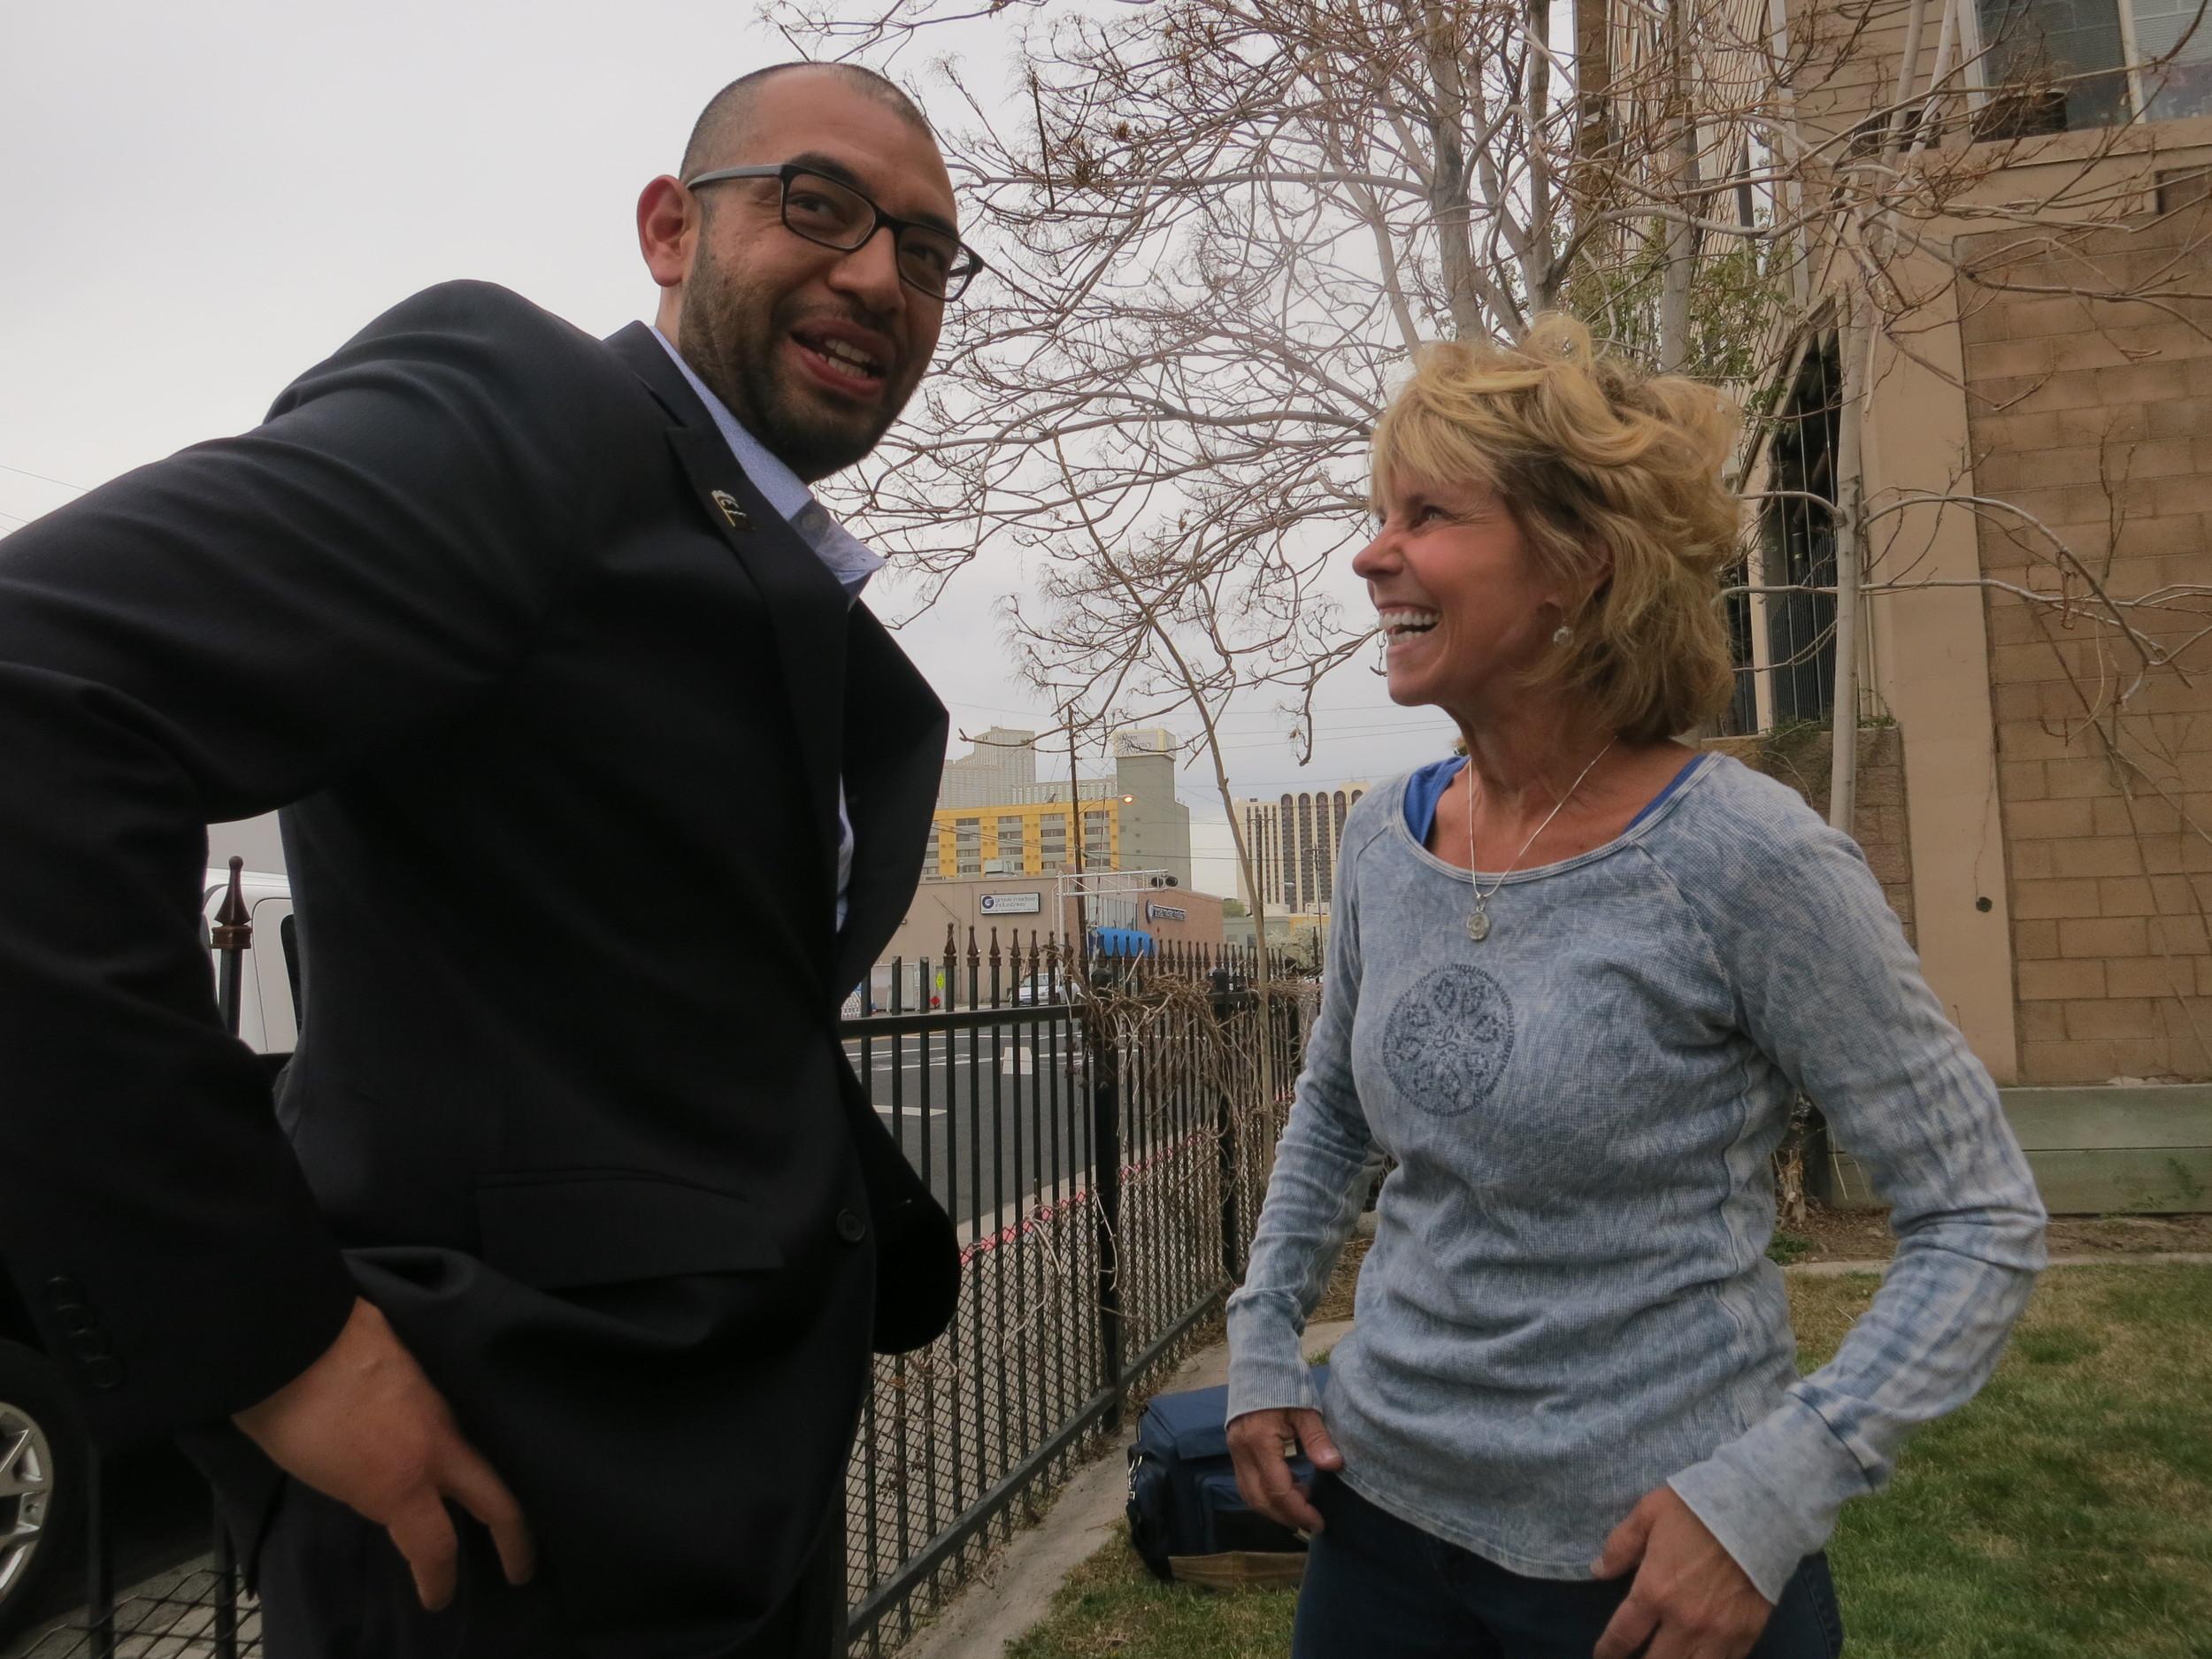 Supportive politicians like City Councilman Oscar Delgado showed up.